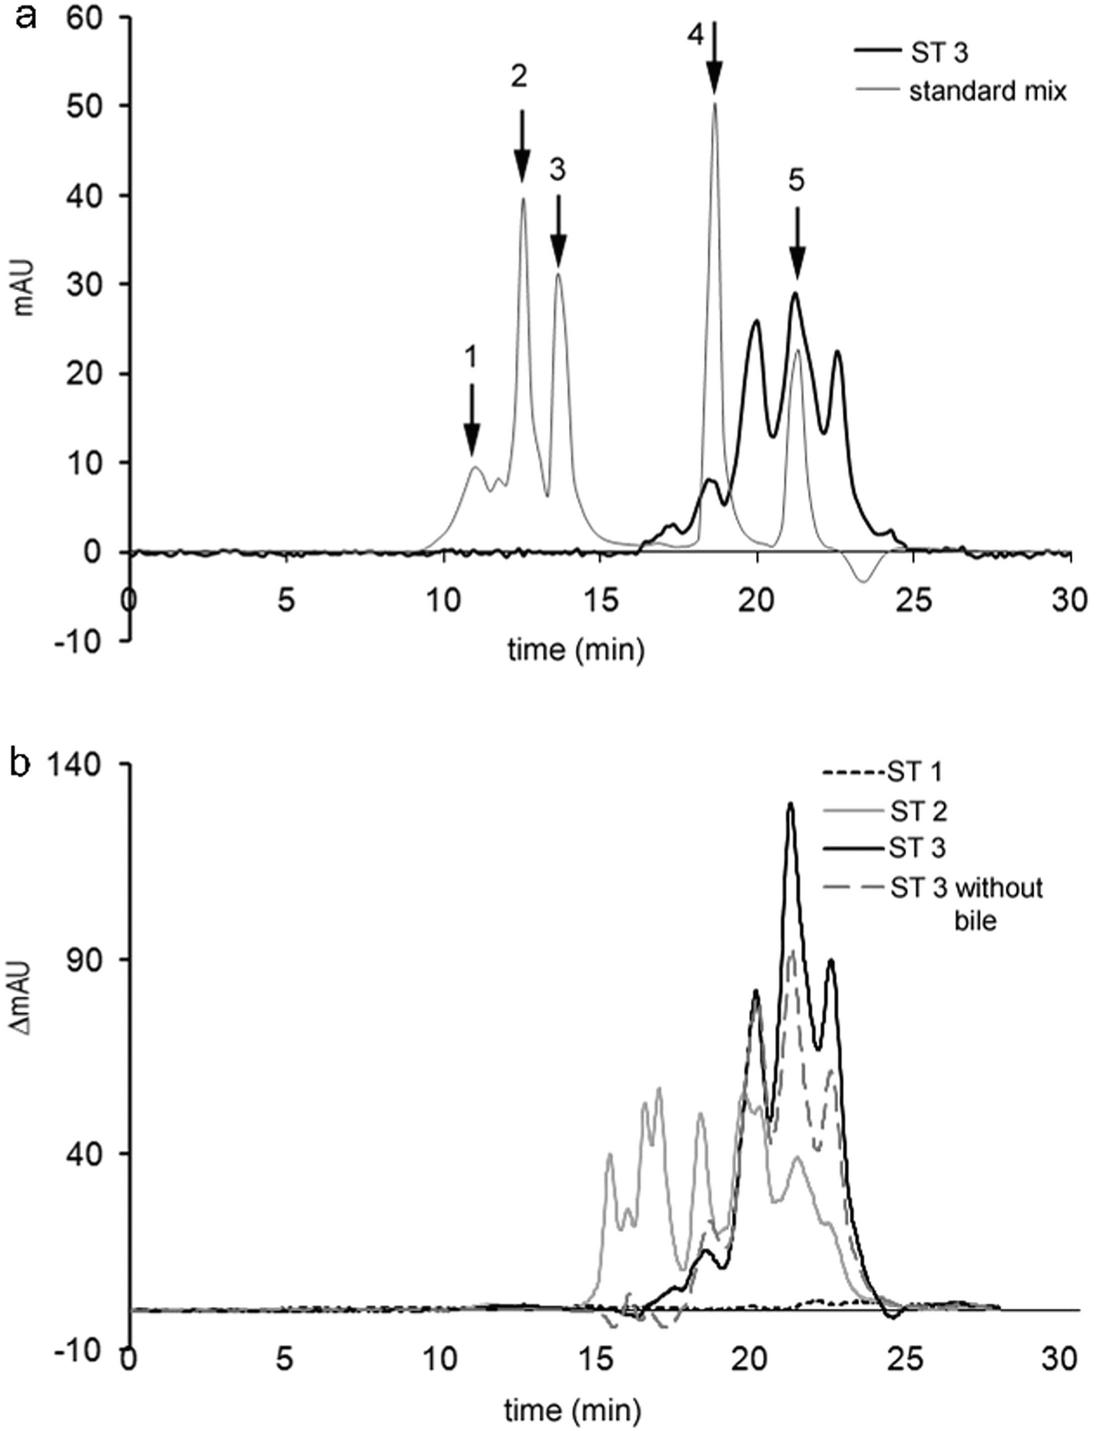 Quantitative Characterization of Digestion Processes | SpringerLink